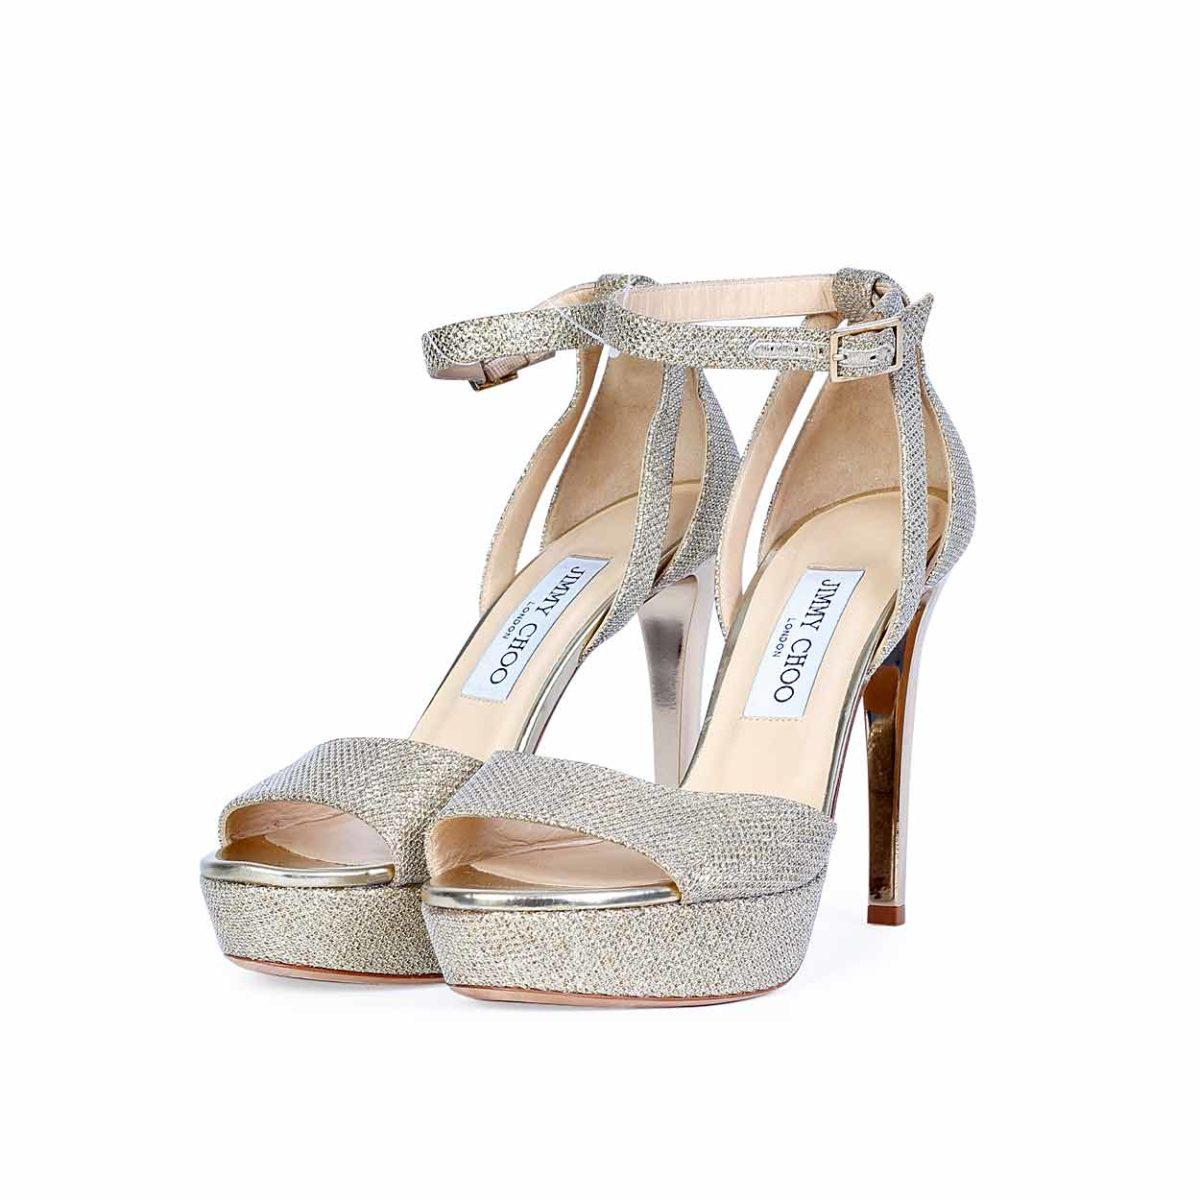 1541b05492a JIMMY CHOO Kayden Champagne Glitter Fabric Platform Sandals - S ...